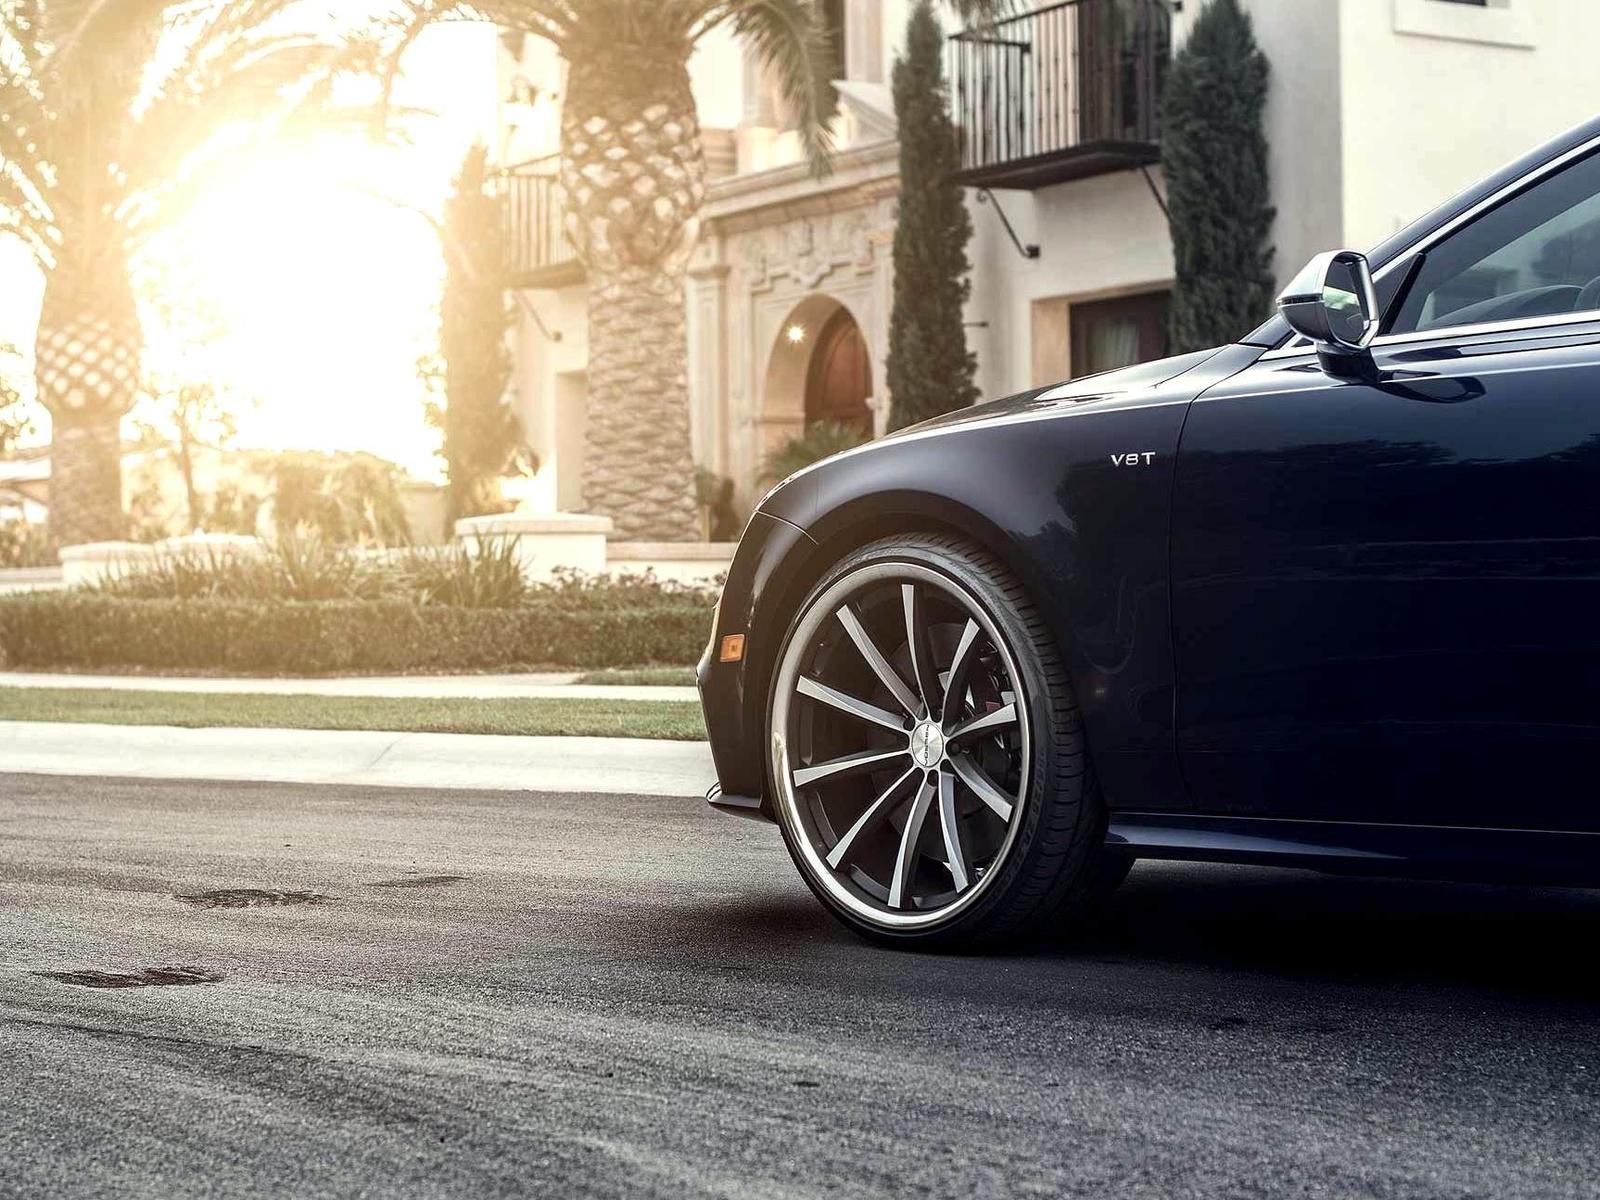 Car, wallpapers, beautiful, a7, tuning, автомобиль, обоя, sun, audi, wheels, vossen